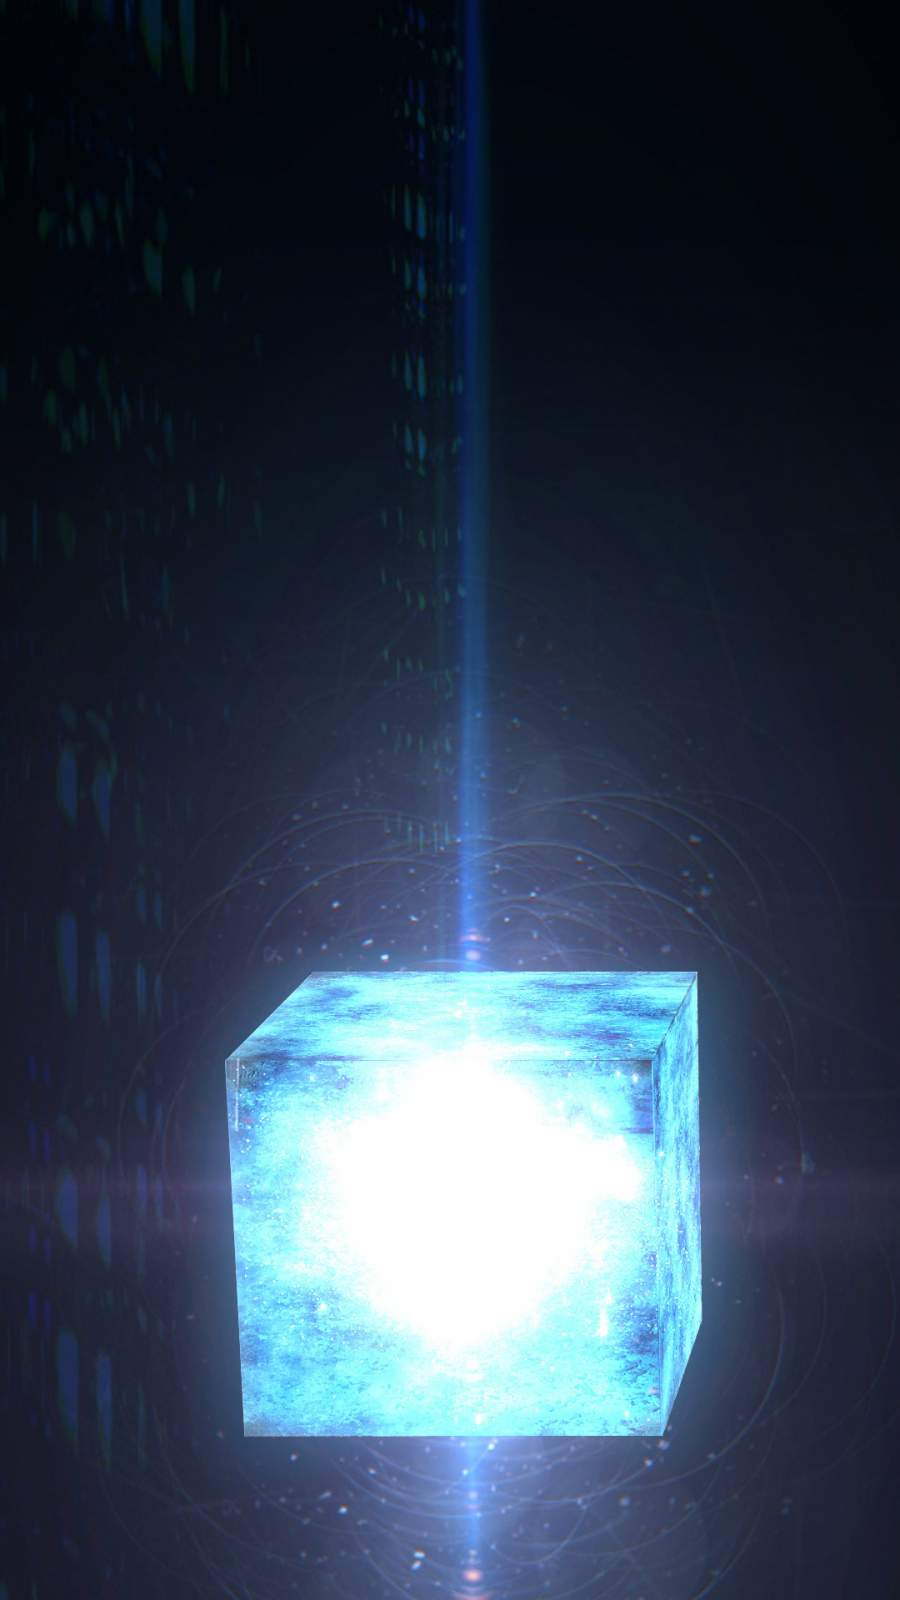 Avengers Tesseract Cube iPhone Wallpaper